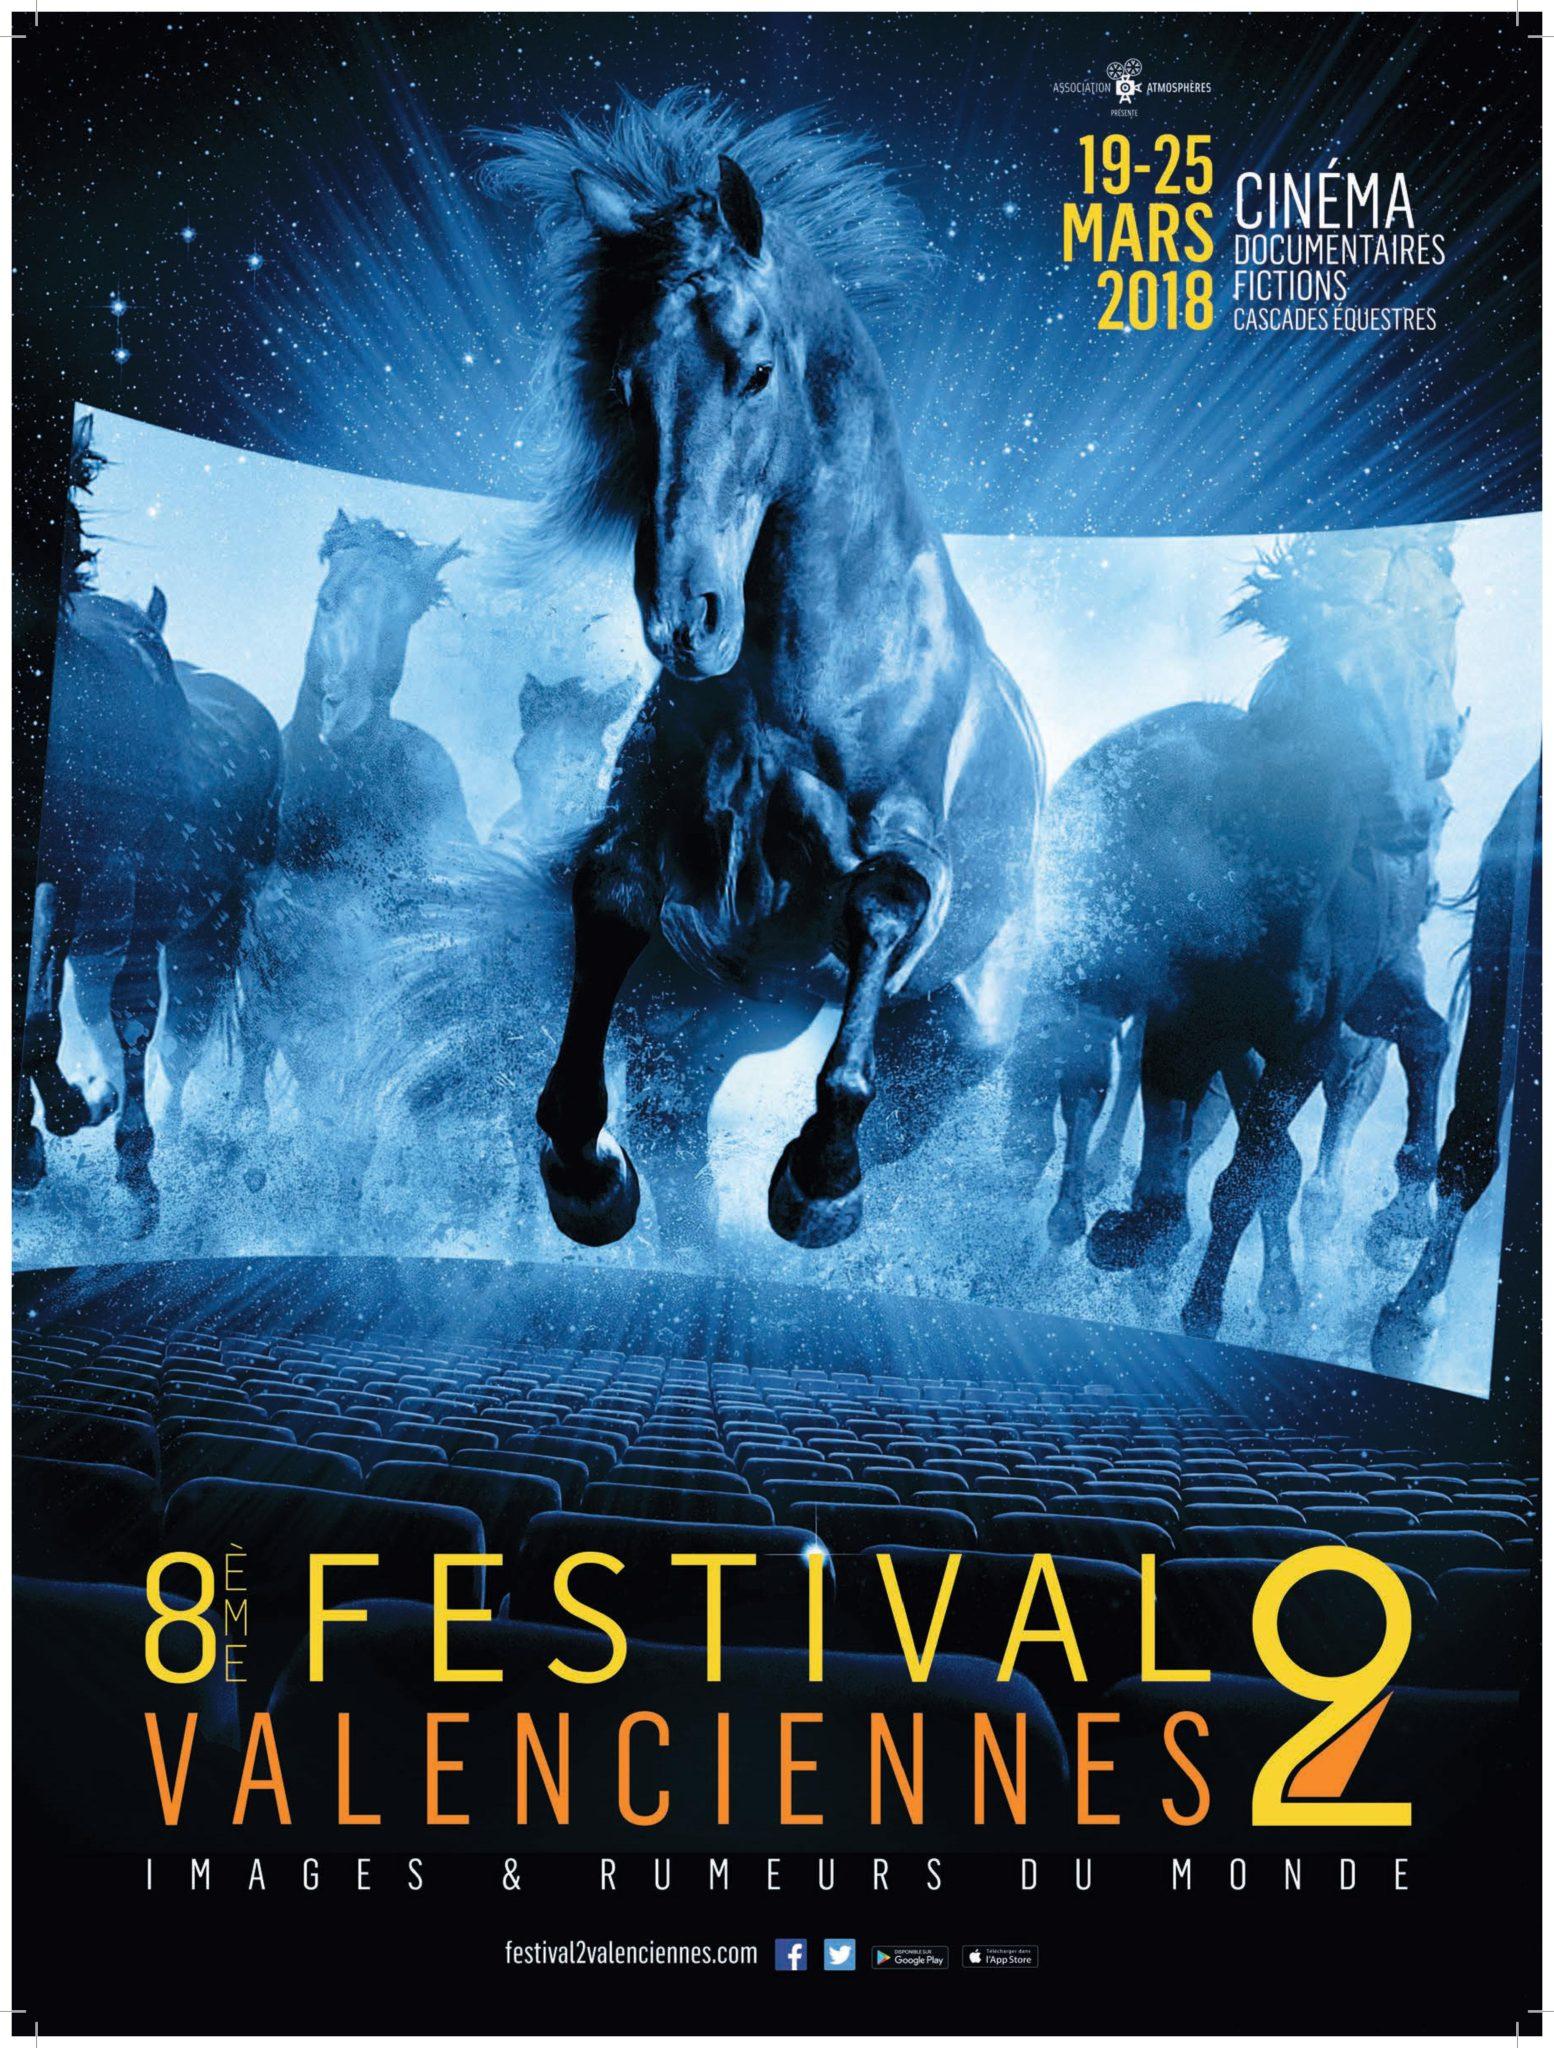 affiche festival 2 valenciennes 2018